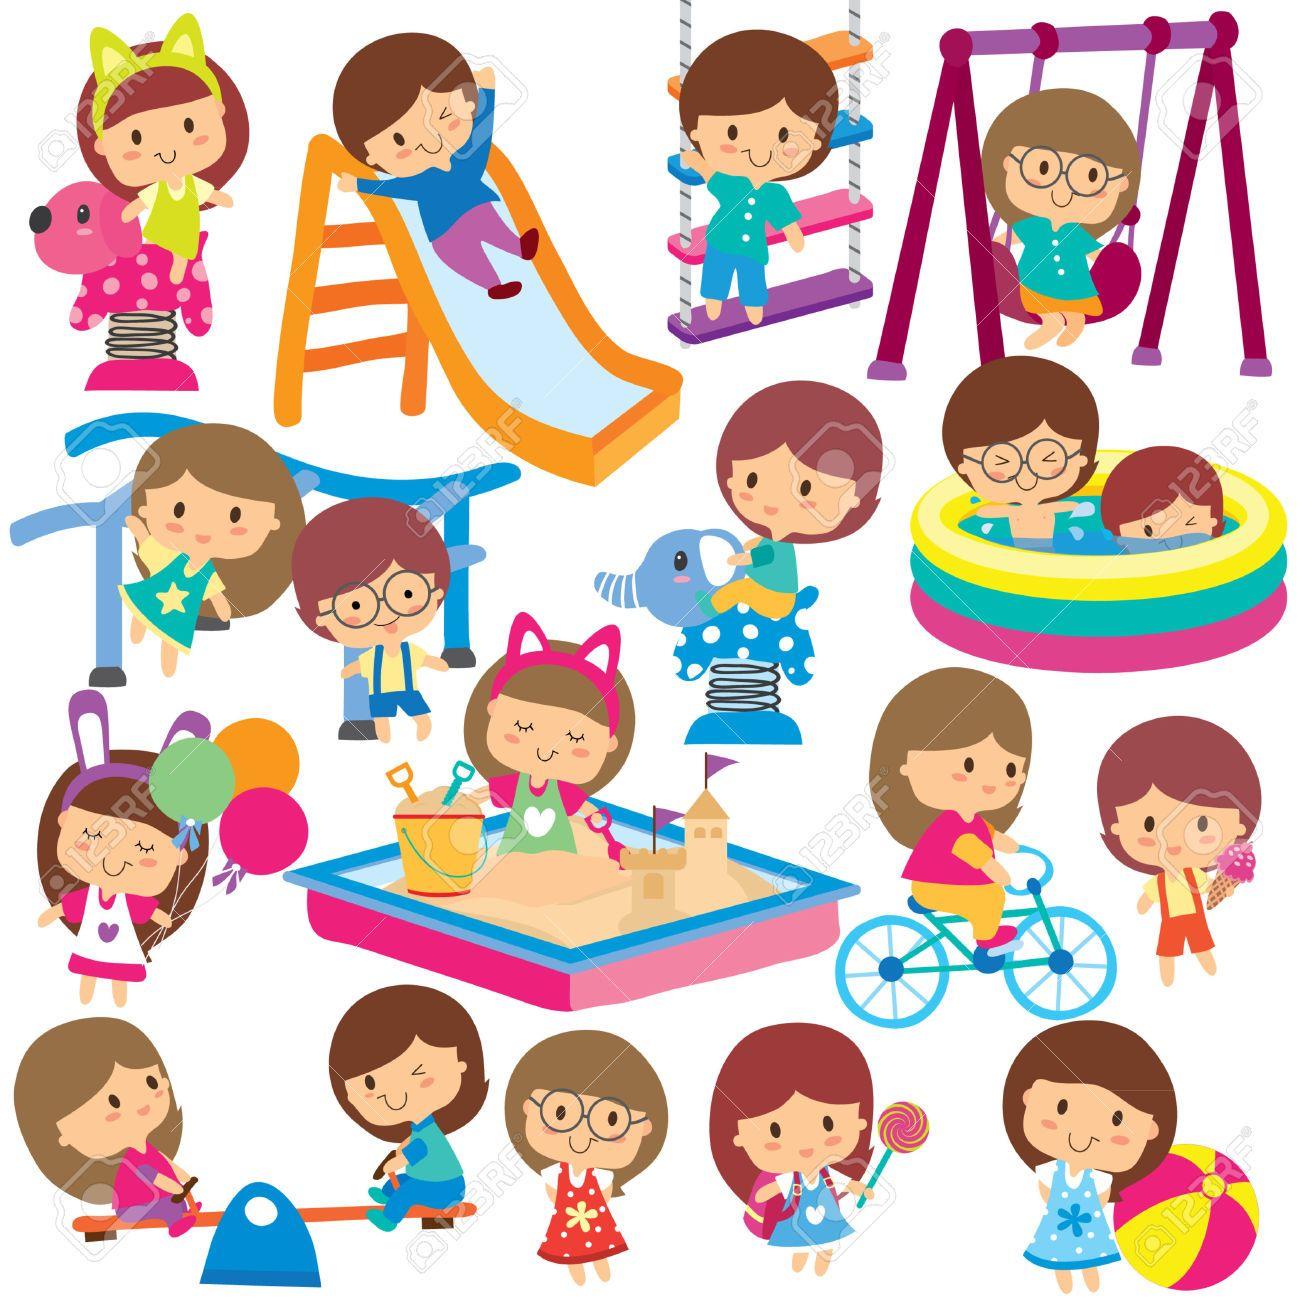 30518834 kids at playground clip art set stock photo jpg 1300 1300 rh pinterest com au